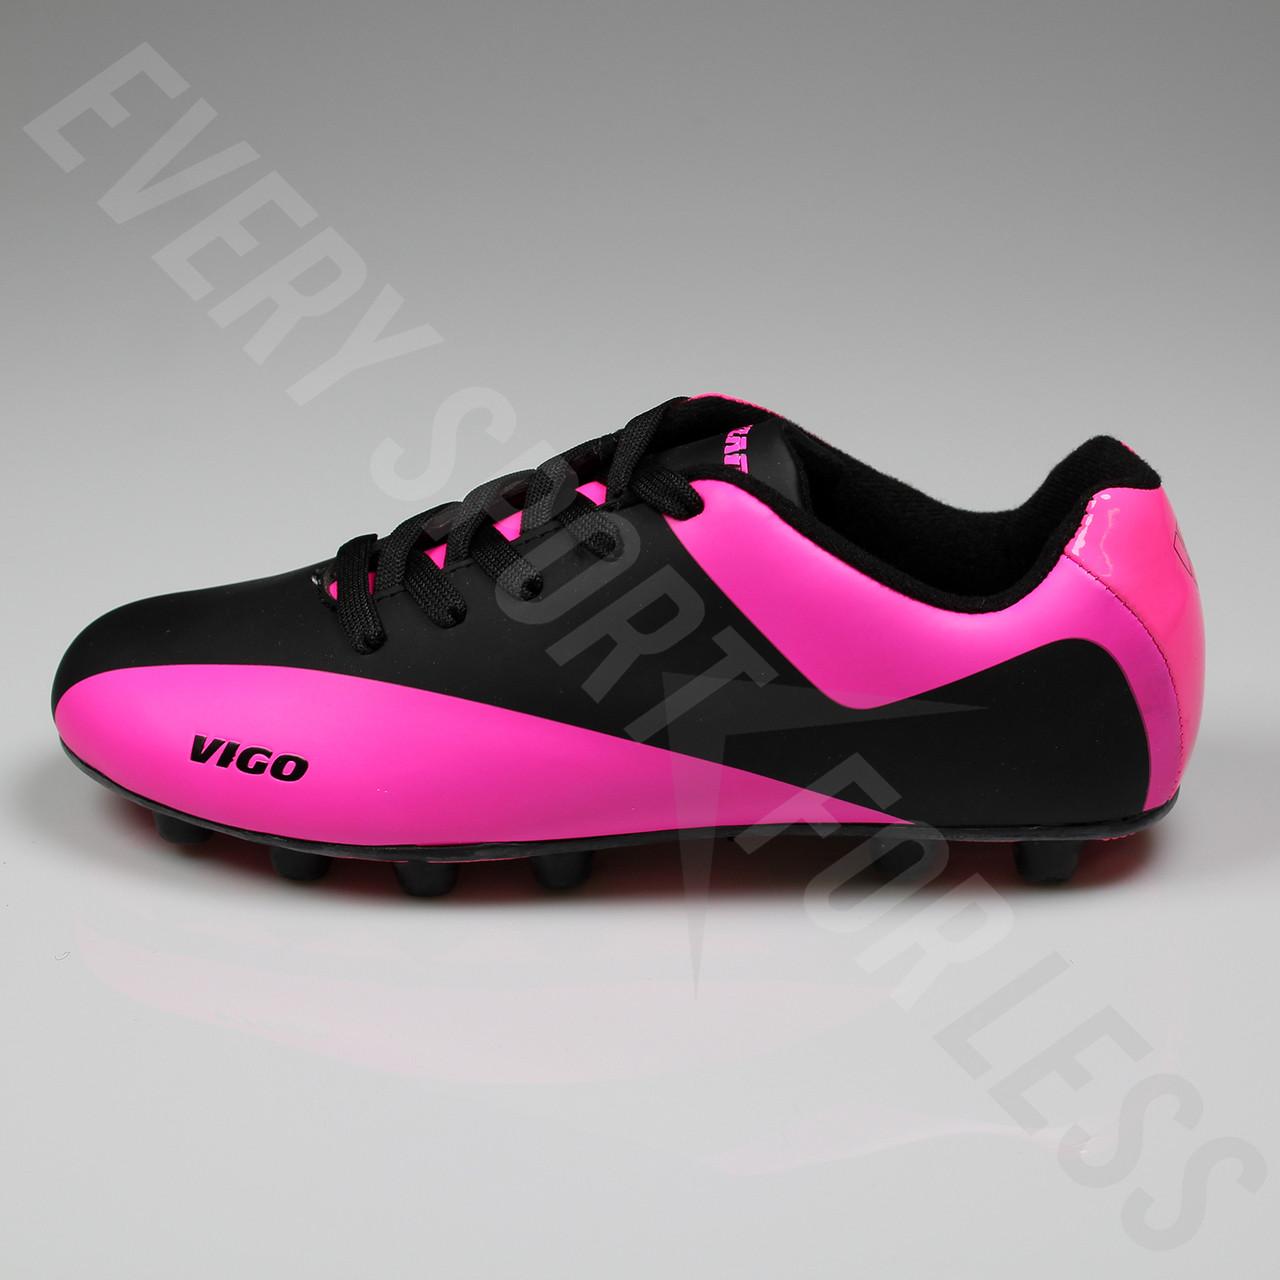 793d3a303c6e ... Vizari Vigo FG Junior Soccer Cleats - Black